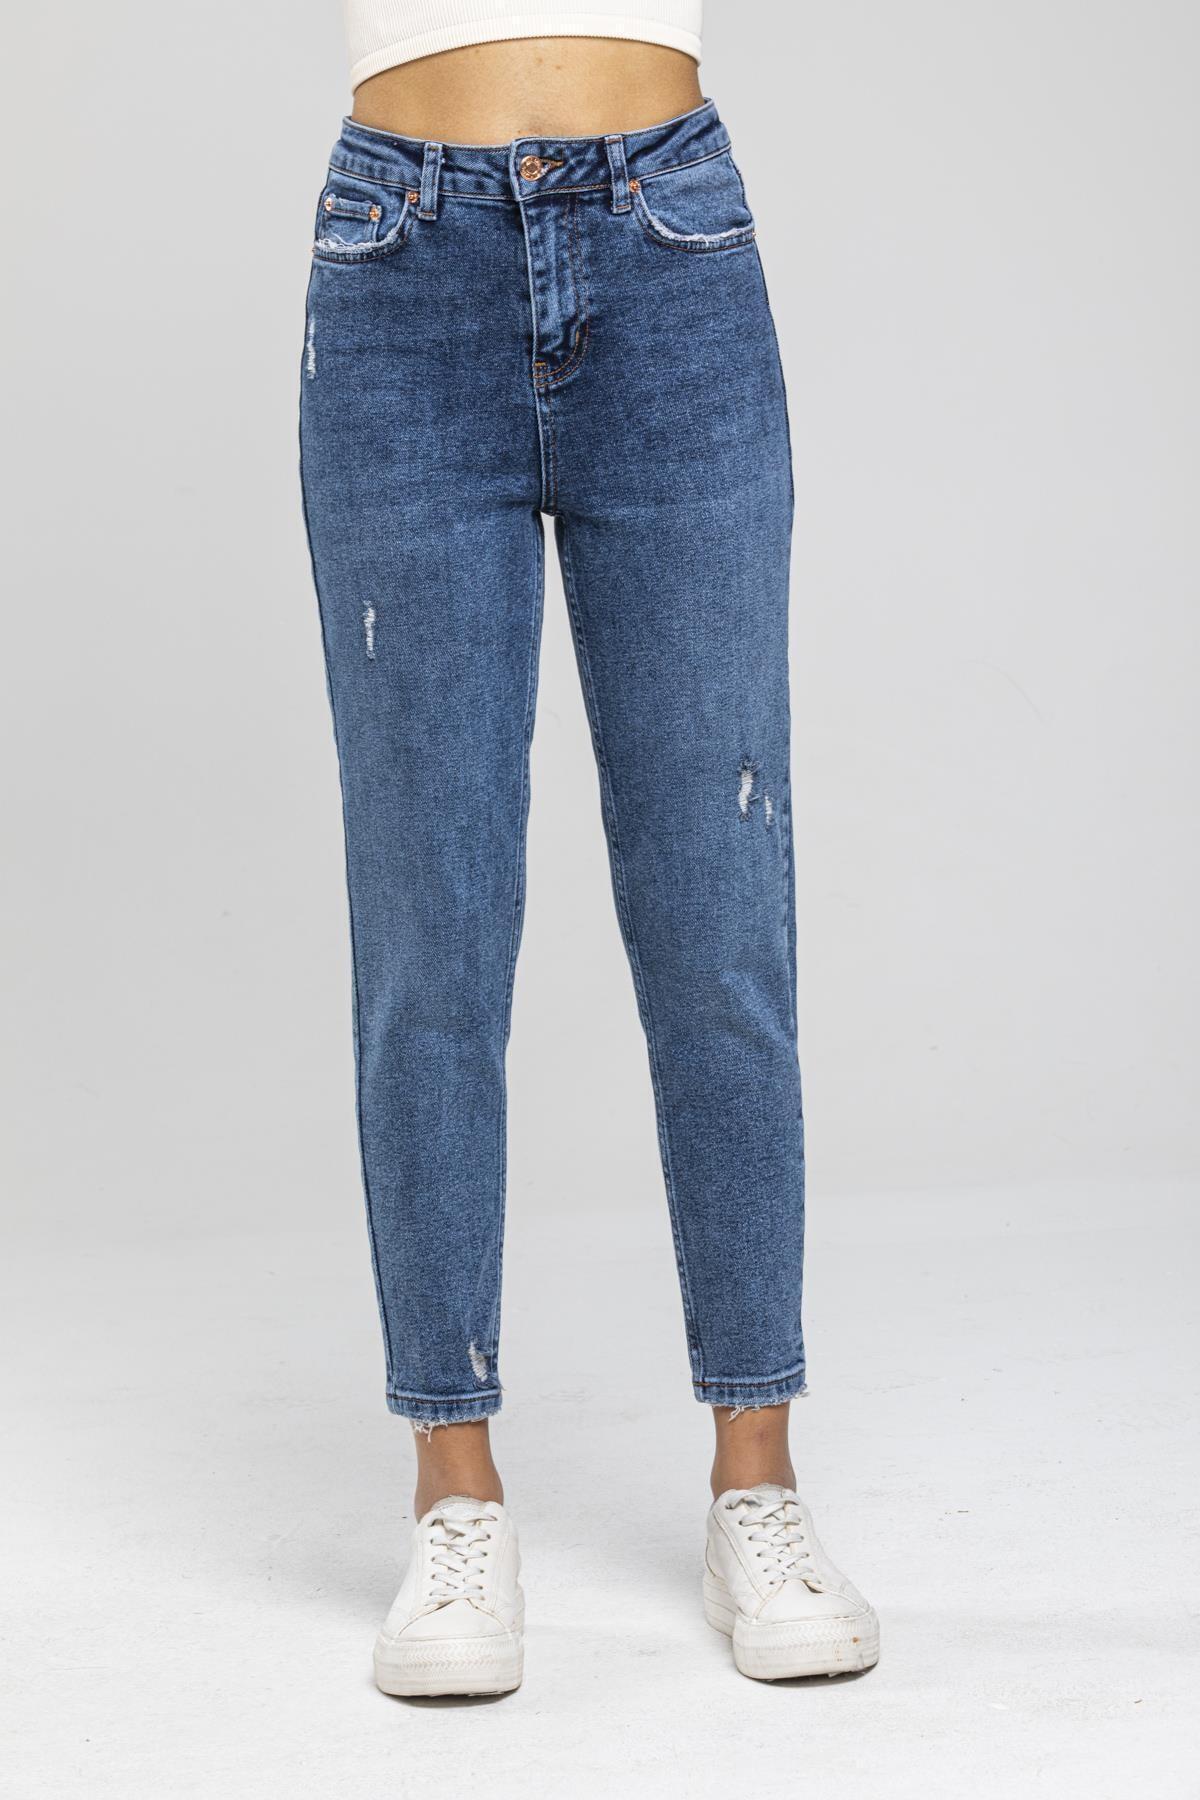 FAF Yüksek Bel Jean Açık Mavi Mom Fit Kot Pantolon 2285 2